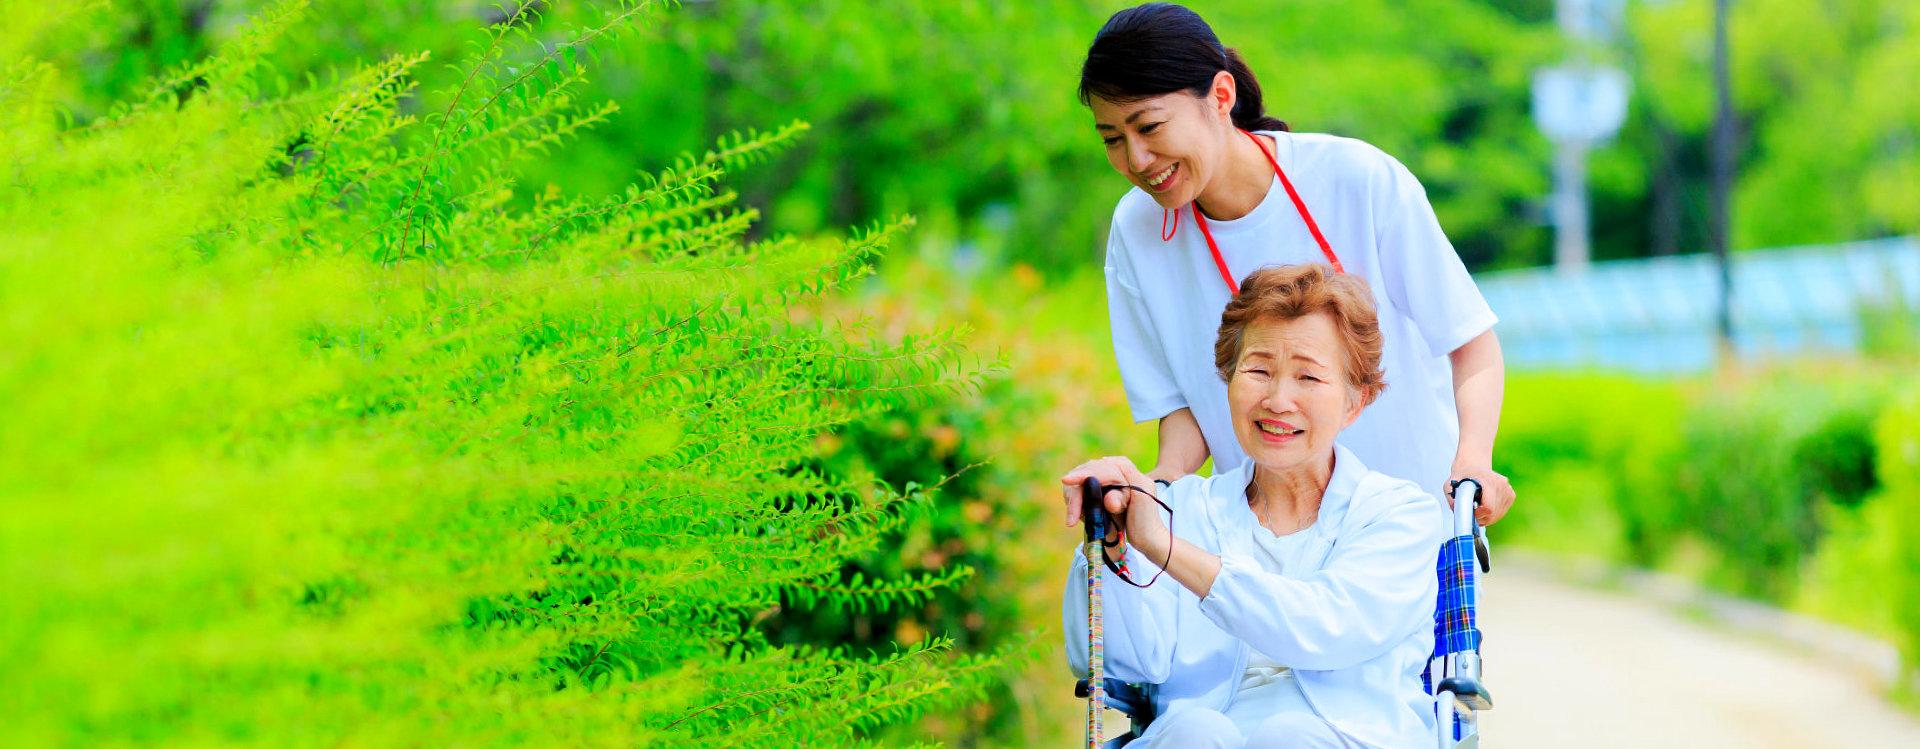 caregiver and senior woman outside senior home